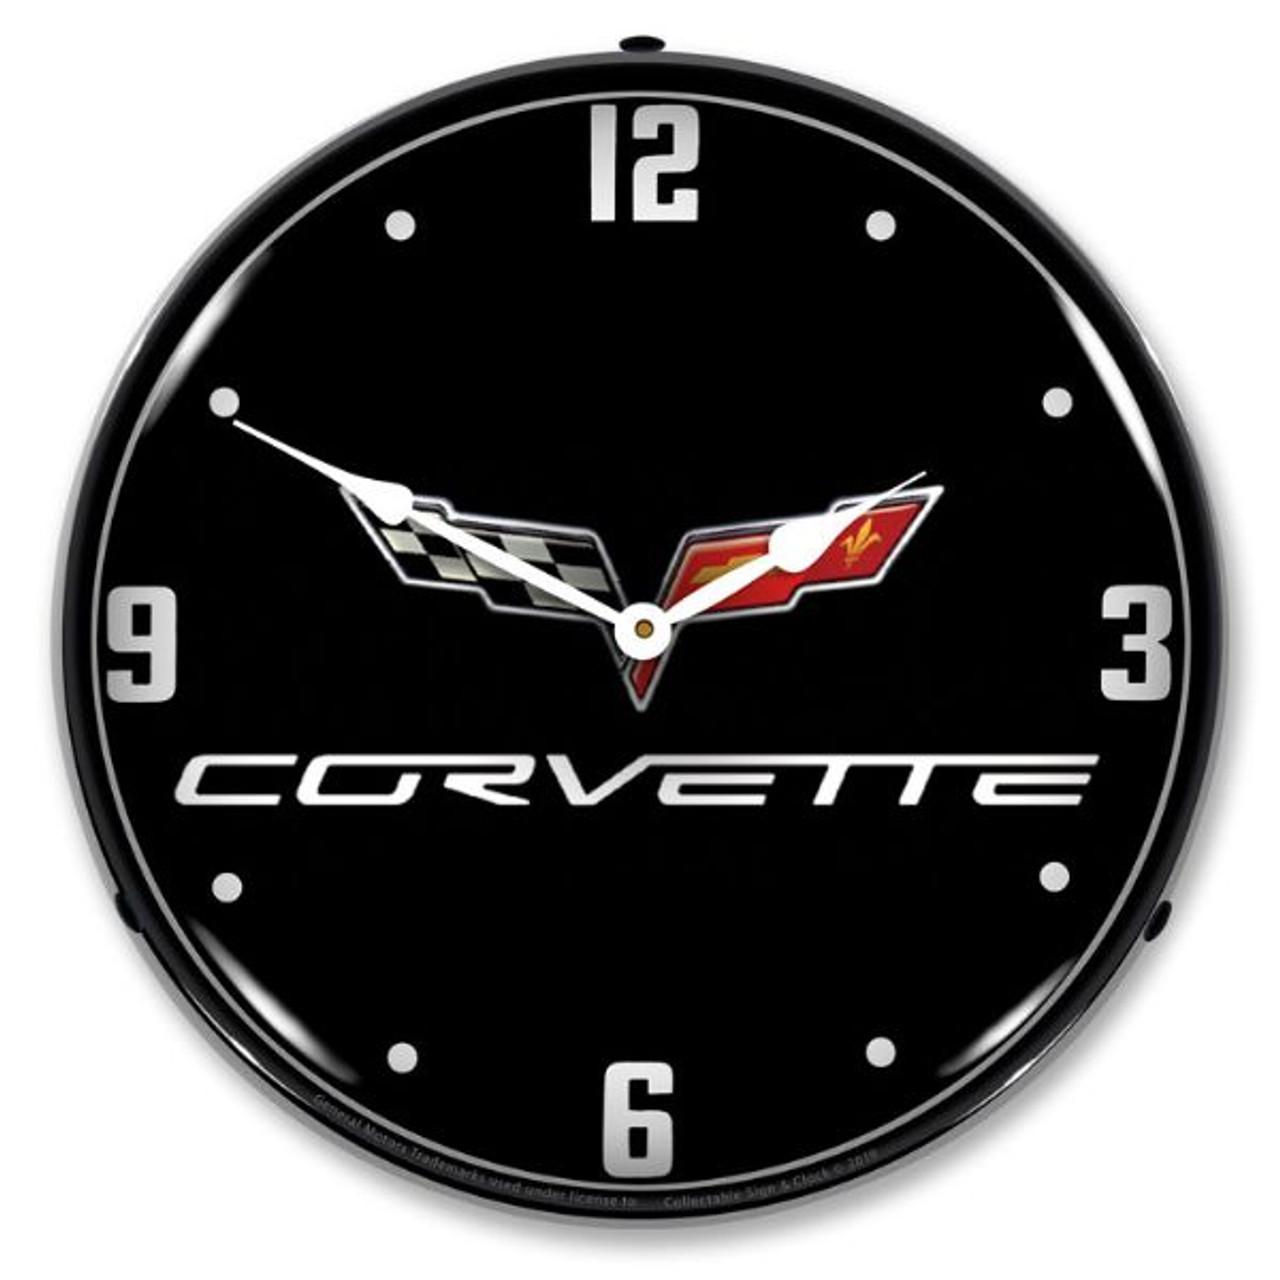 C6 Corvette Black Tie LED Backlit Clock